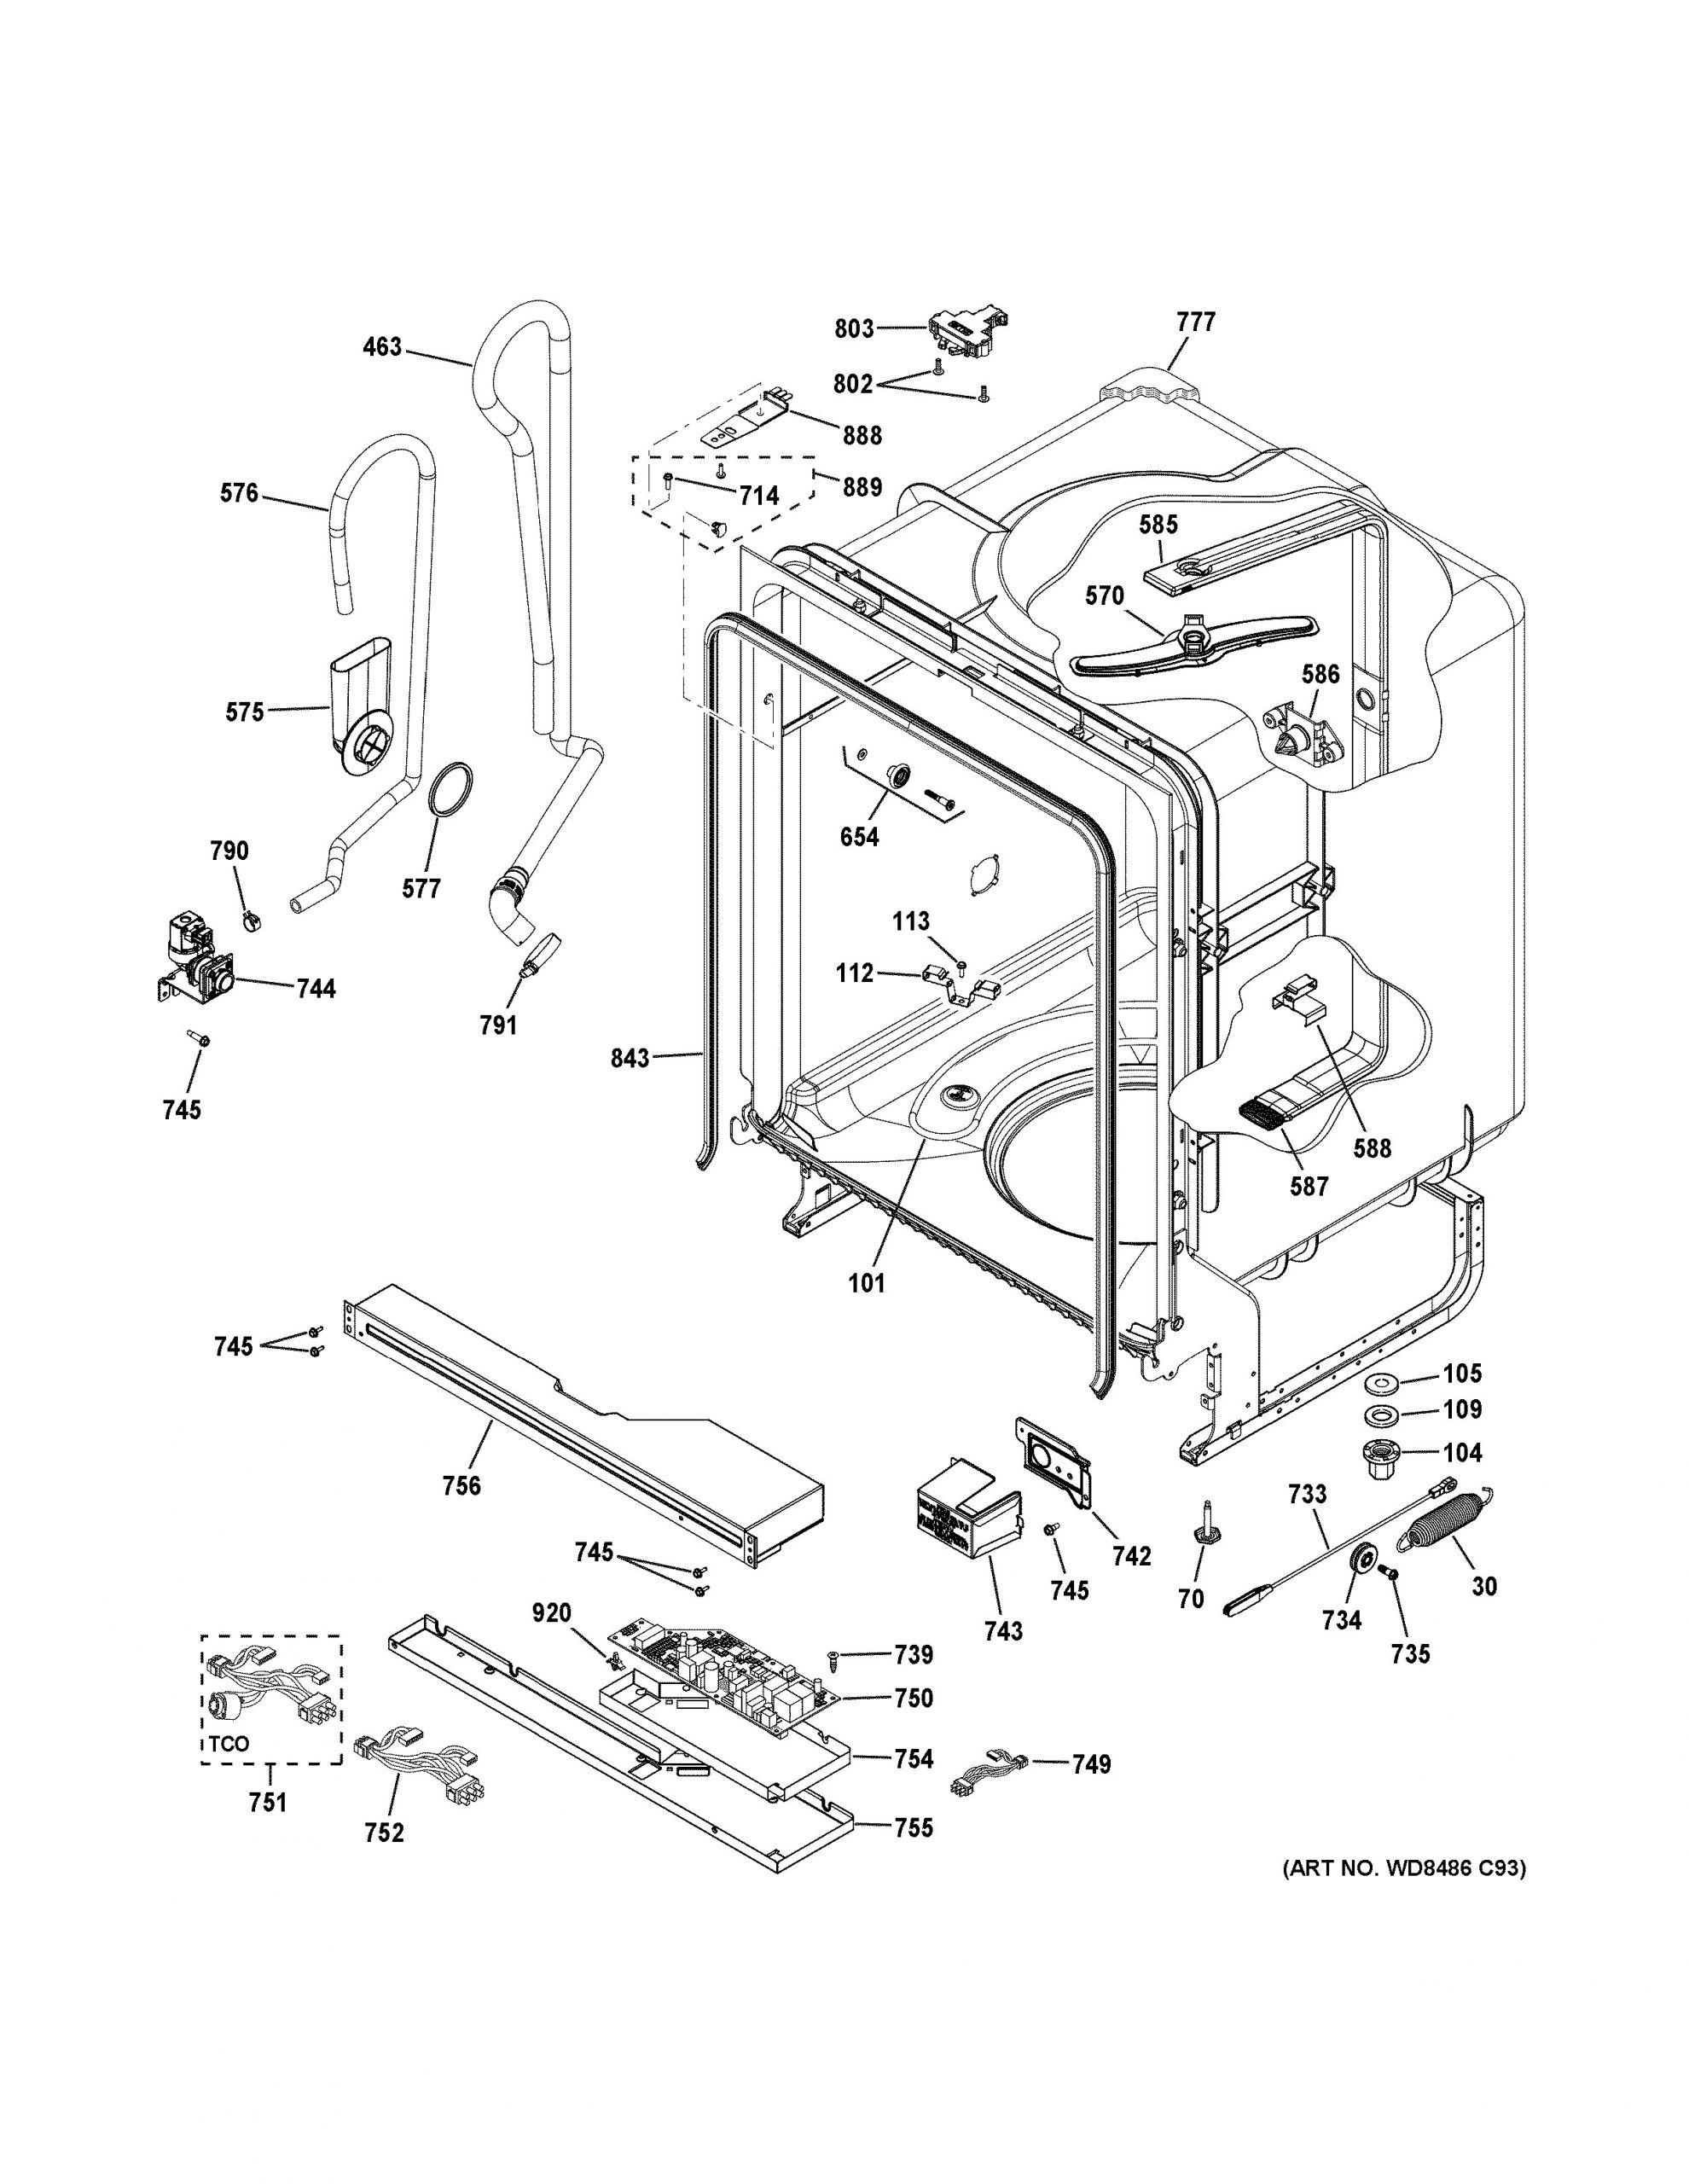 Asko Dishwasher Dbi675 Parts Diagram 35 asko Dishwasher Parts Diagram Wiring Diagram Database Of Asko Dishwasher Dbi675 Parts Diagram